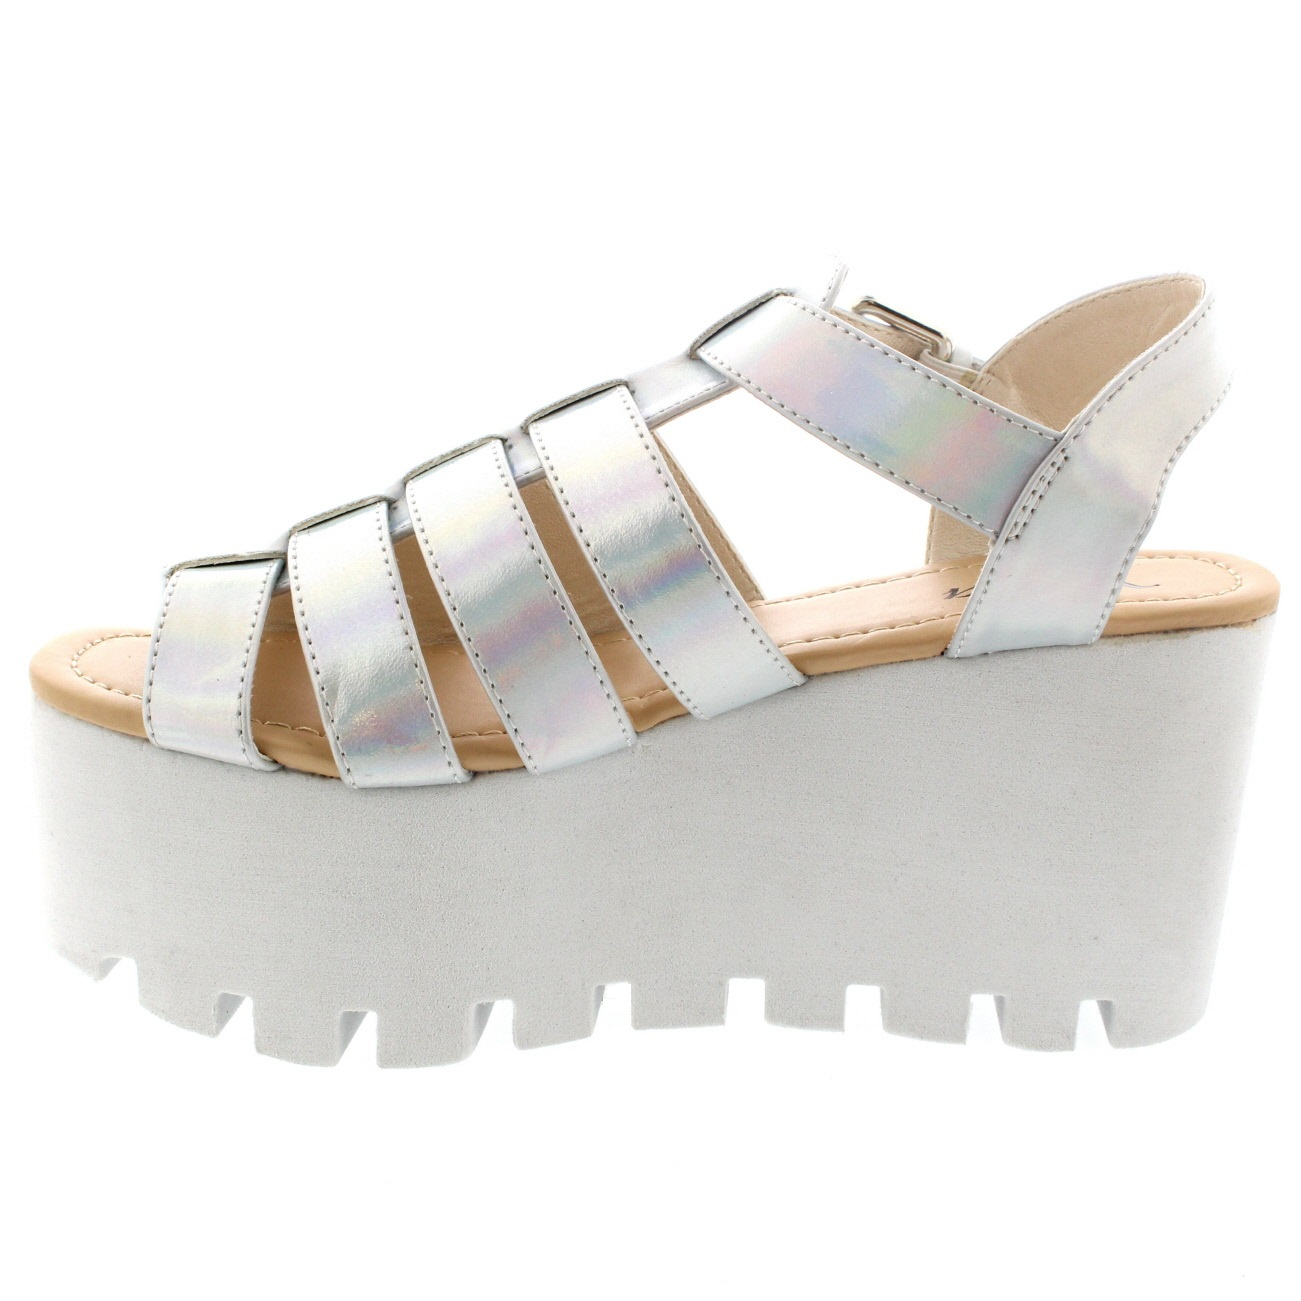 Ladies Buckle Hologram Flatform Shoes Platform Gladiator Wedge ...